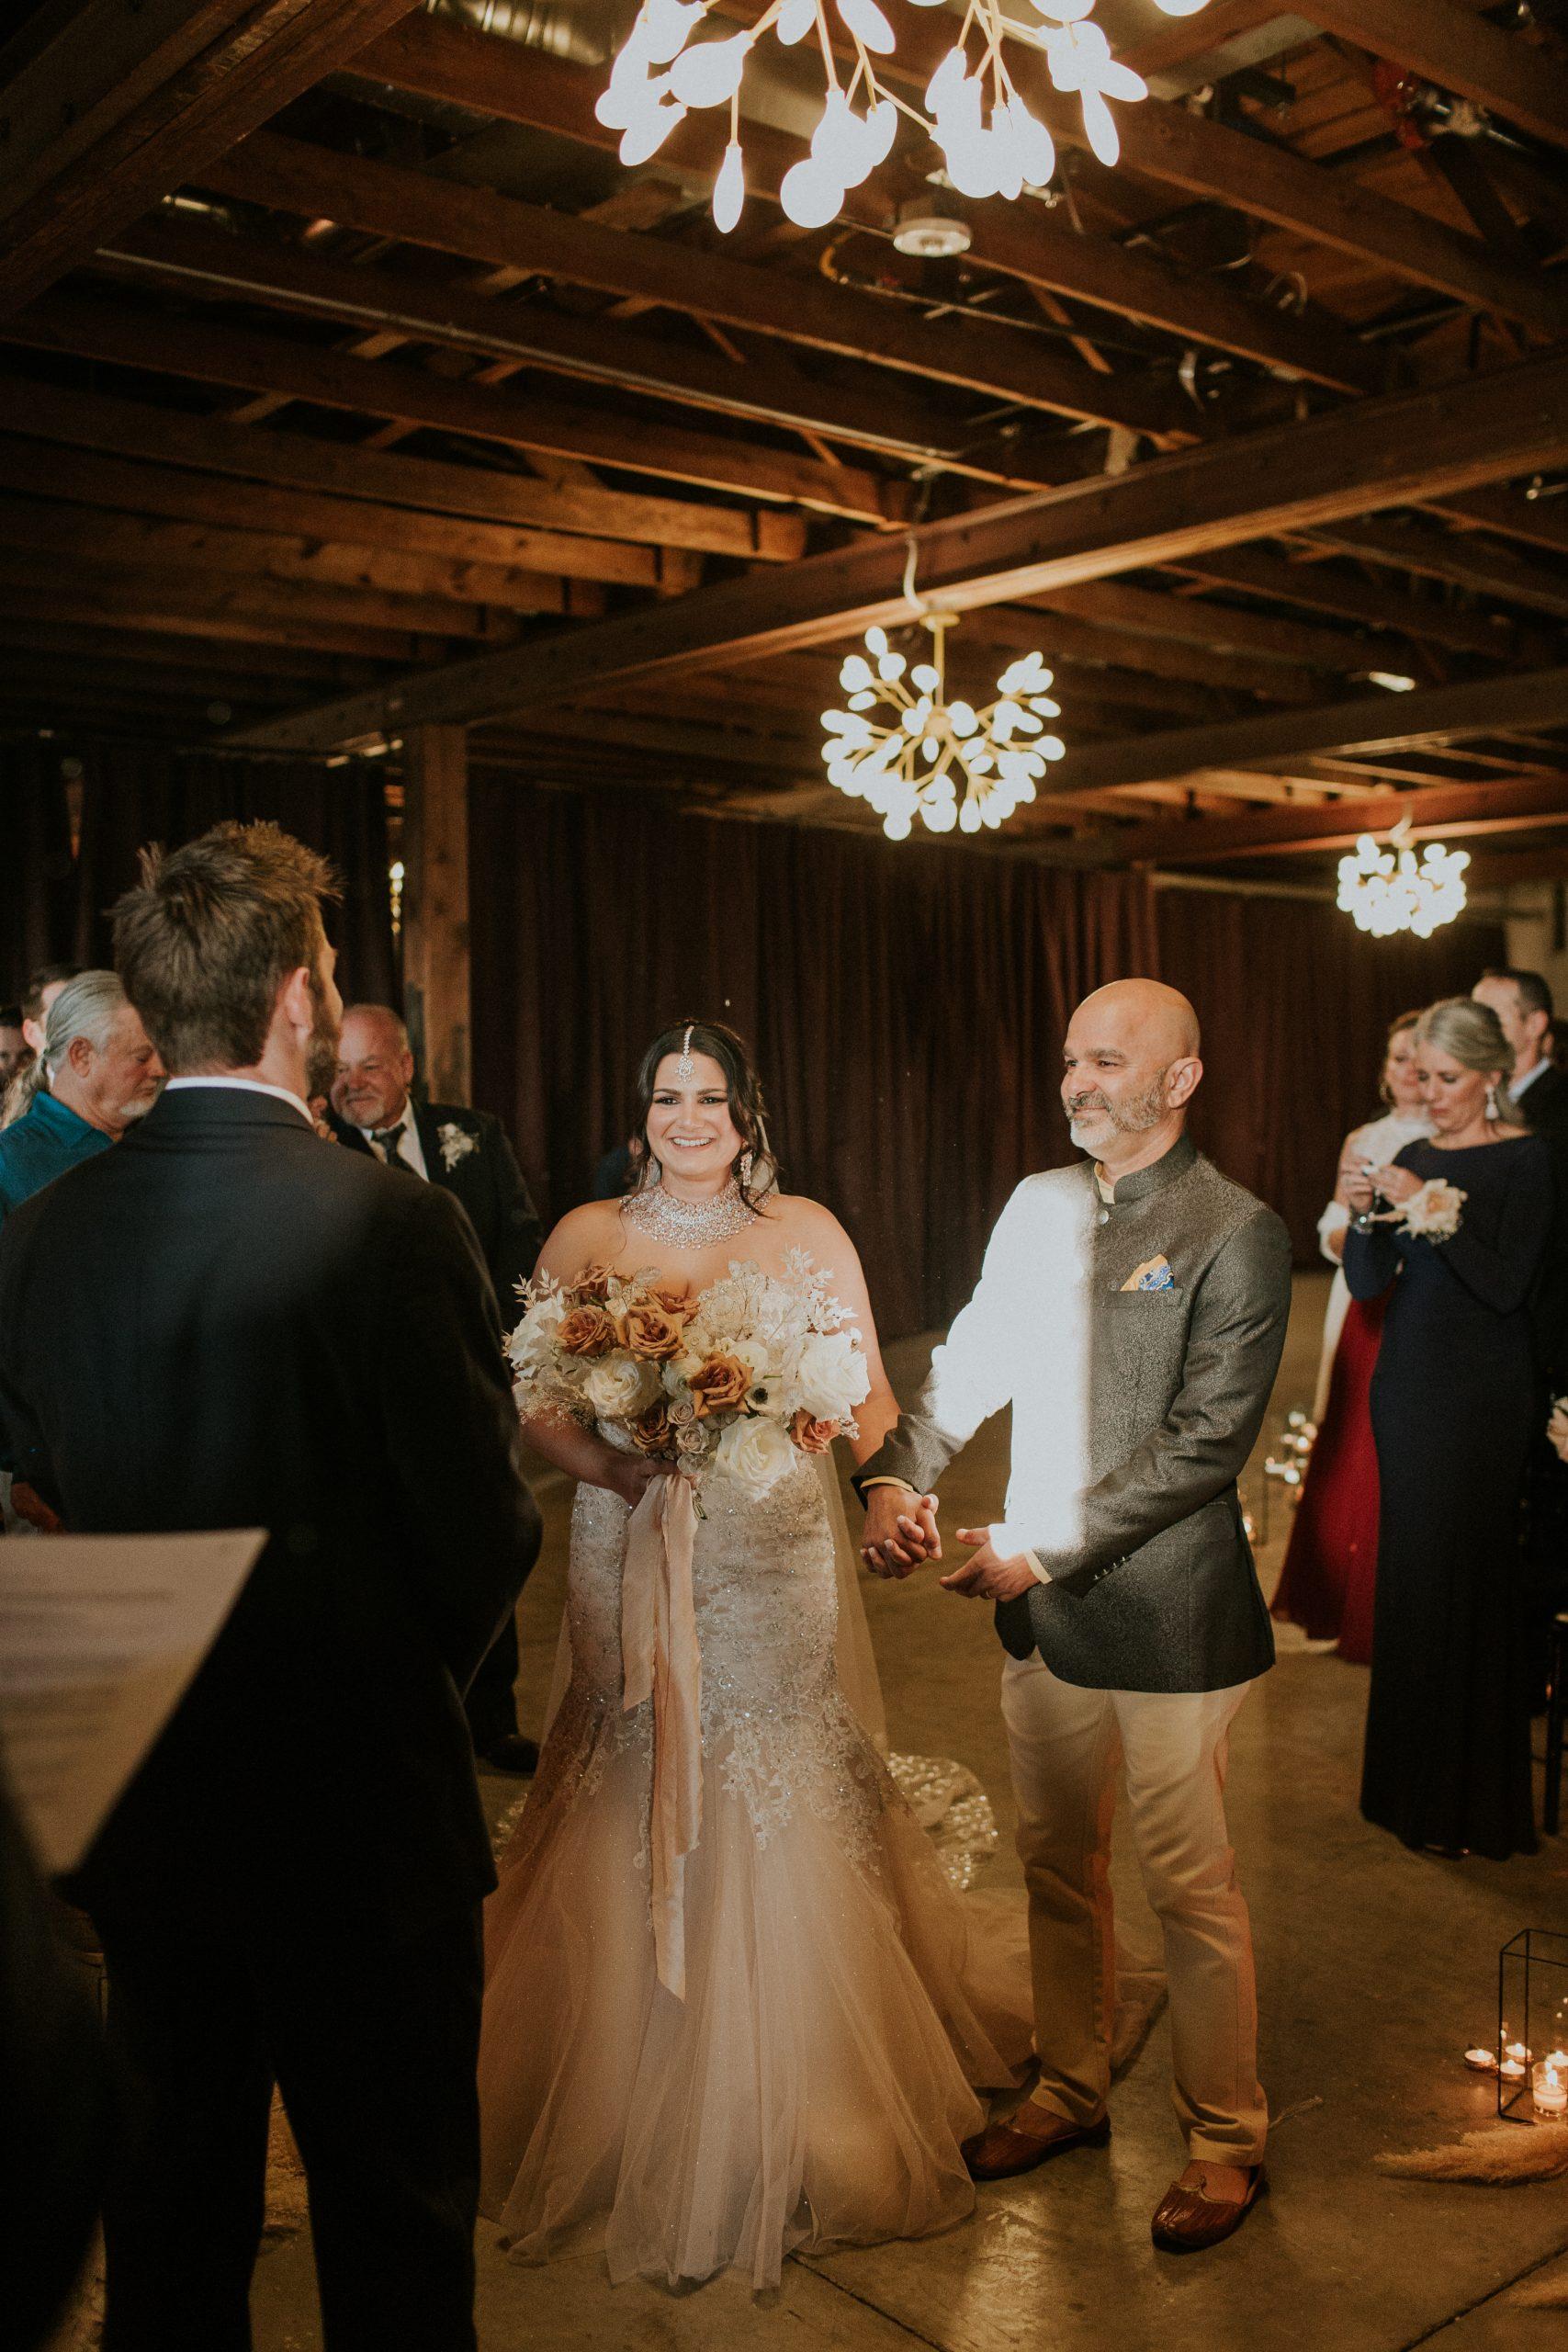 Winter Romance Wedding - Ceremony